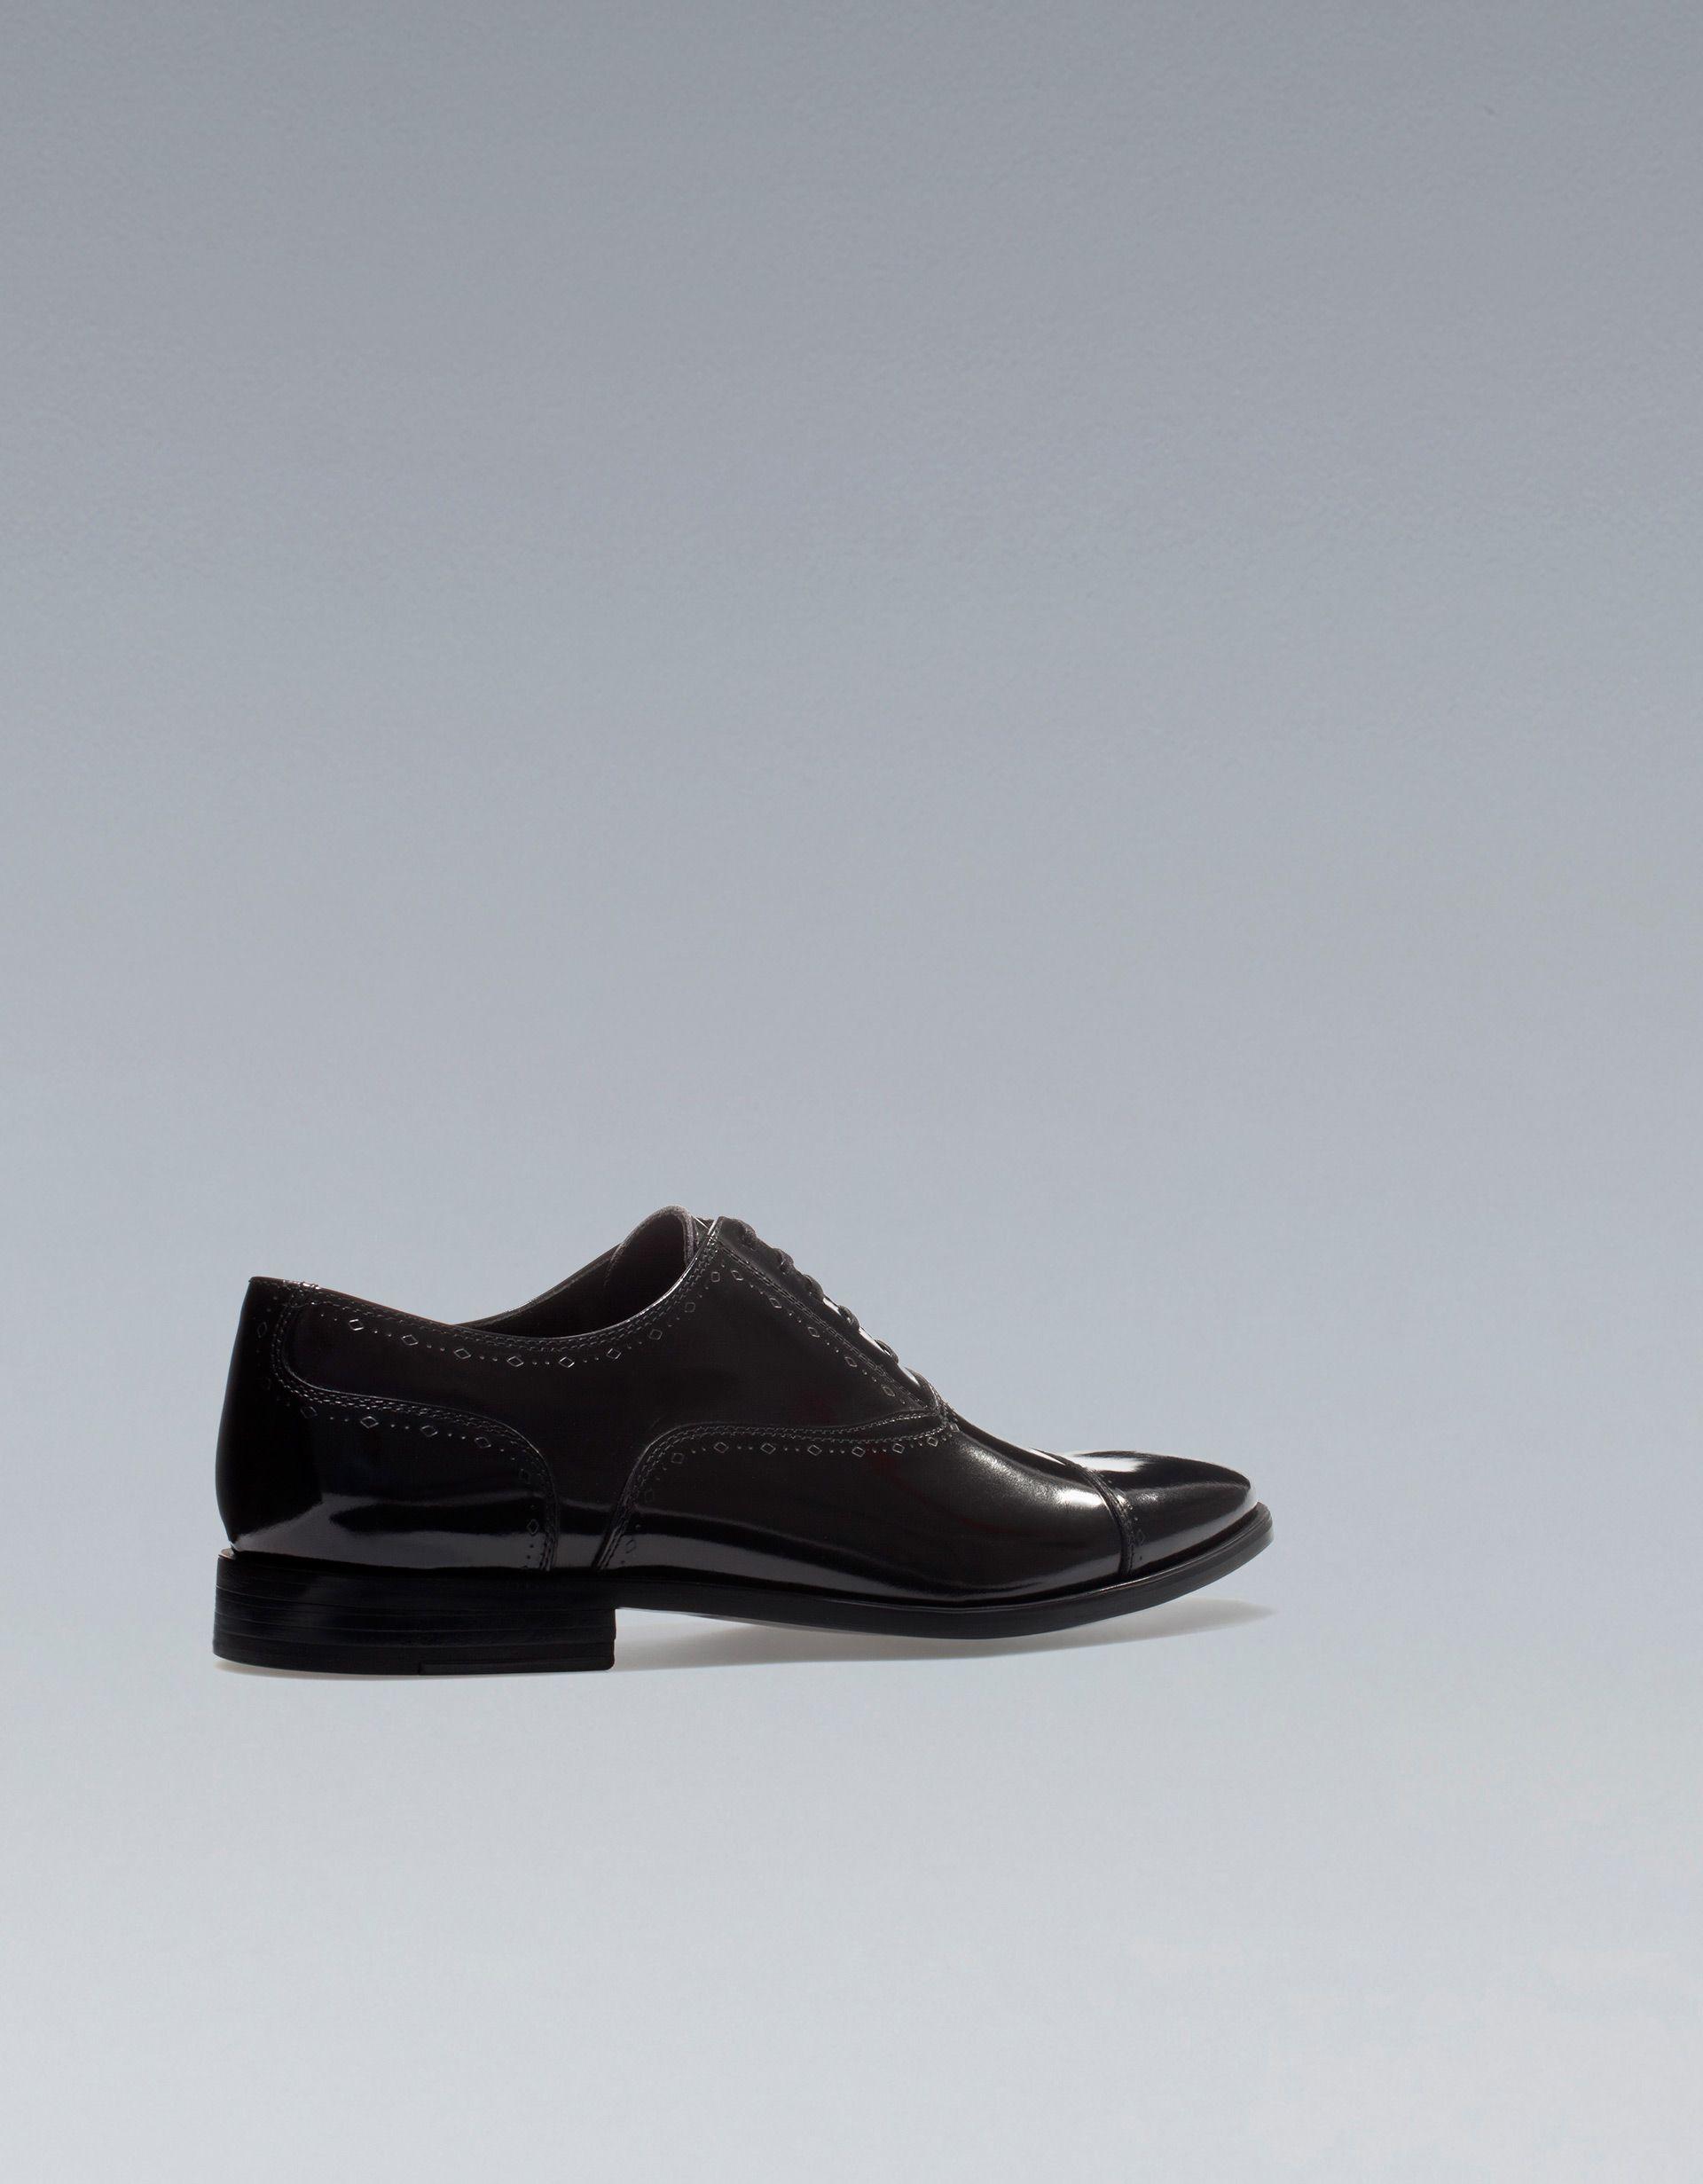 5/5 Zara Black Antik Leather Oxford Shoe with Detailing